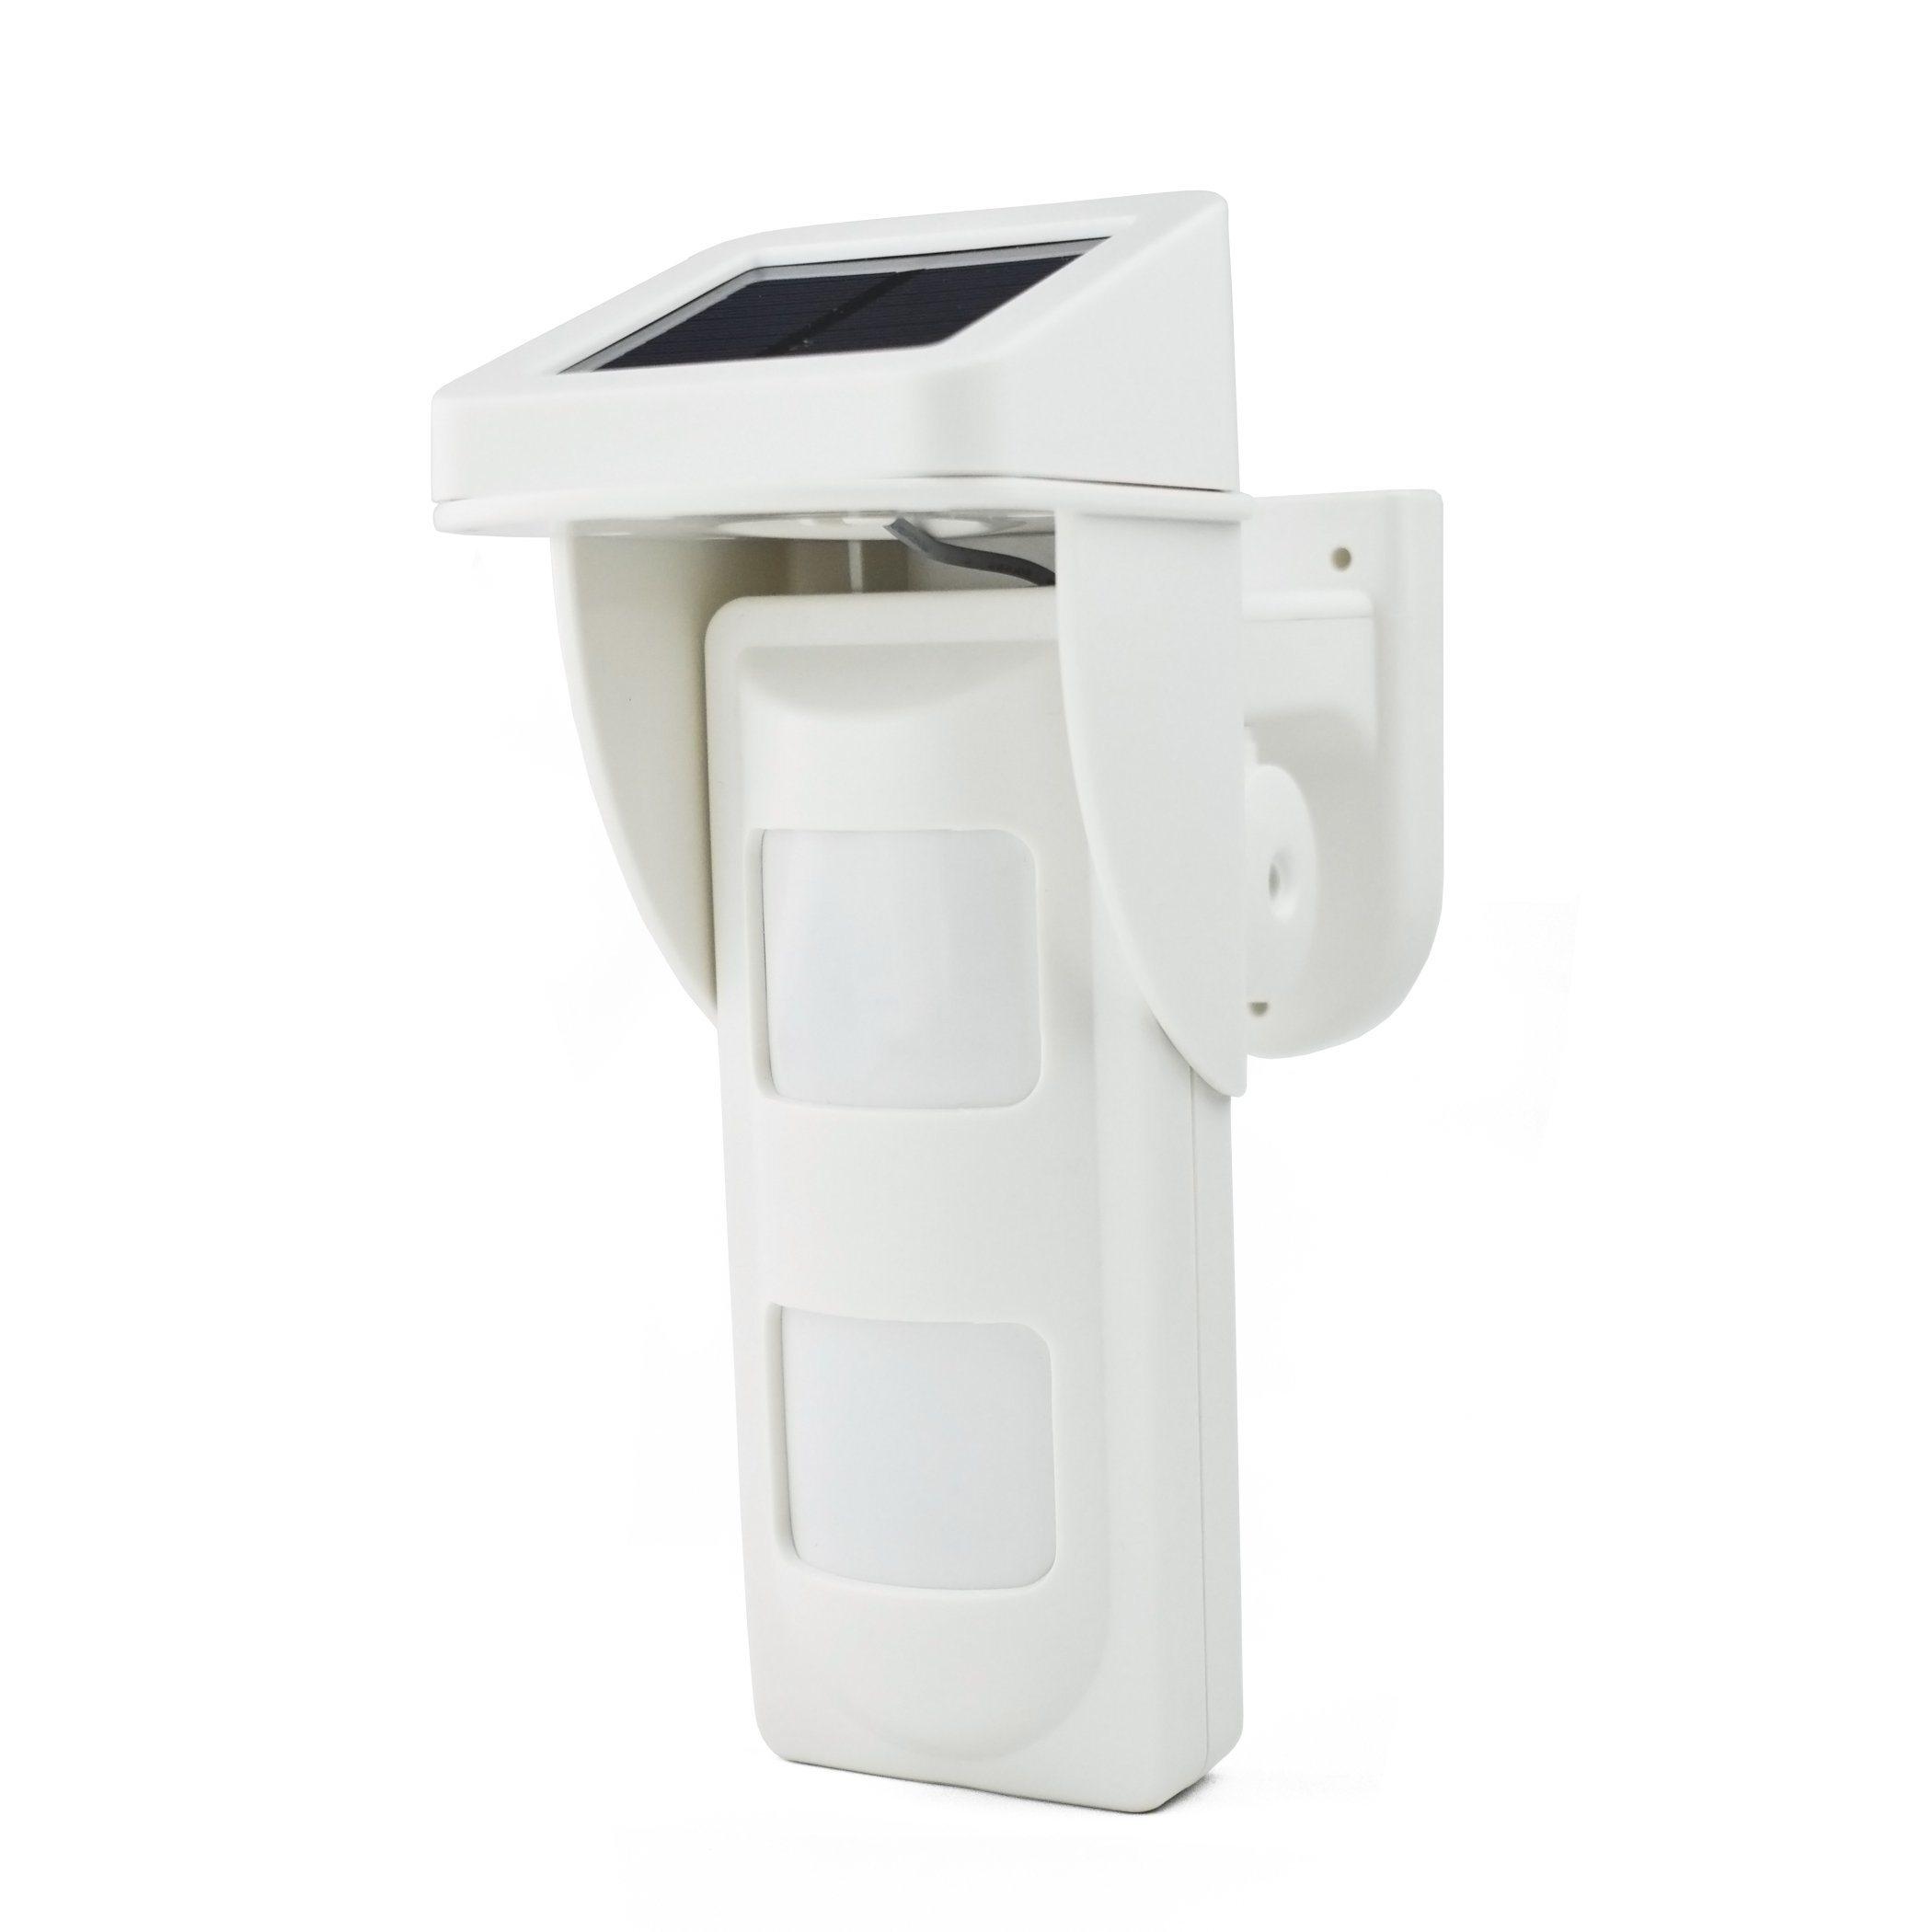 GSM Alarms Outdoor Solar Powered Wireless Dual PIR Pet Immune Waterproof IP65